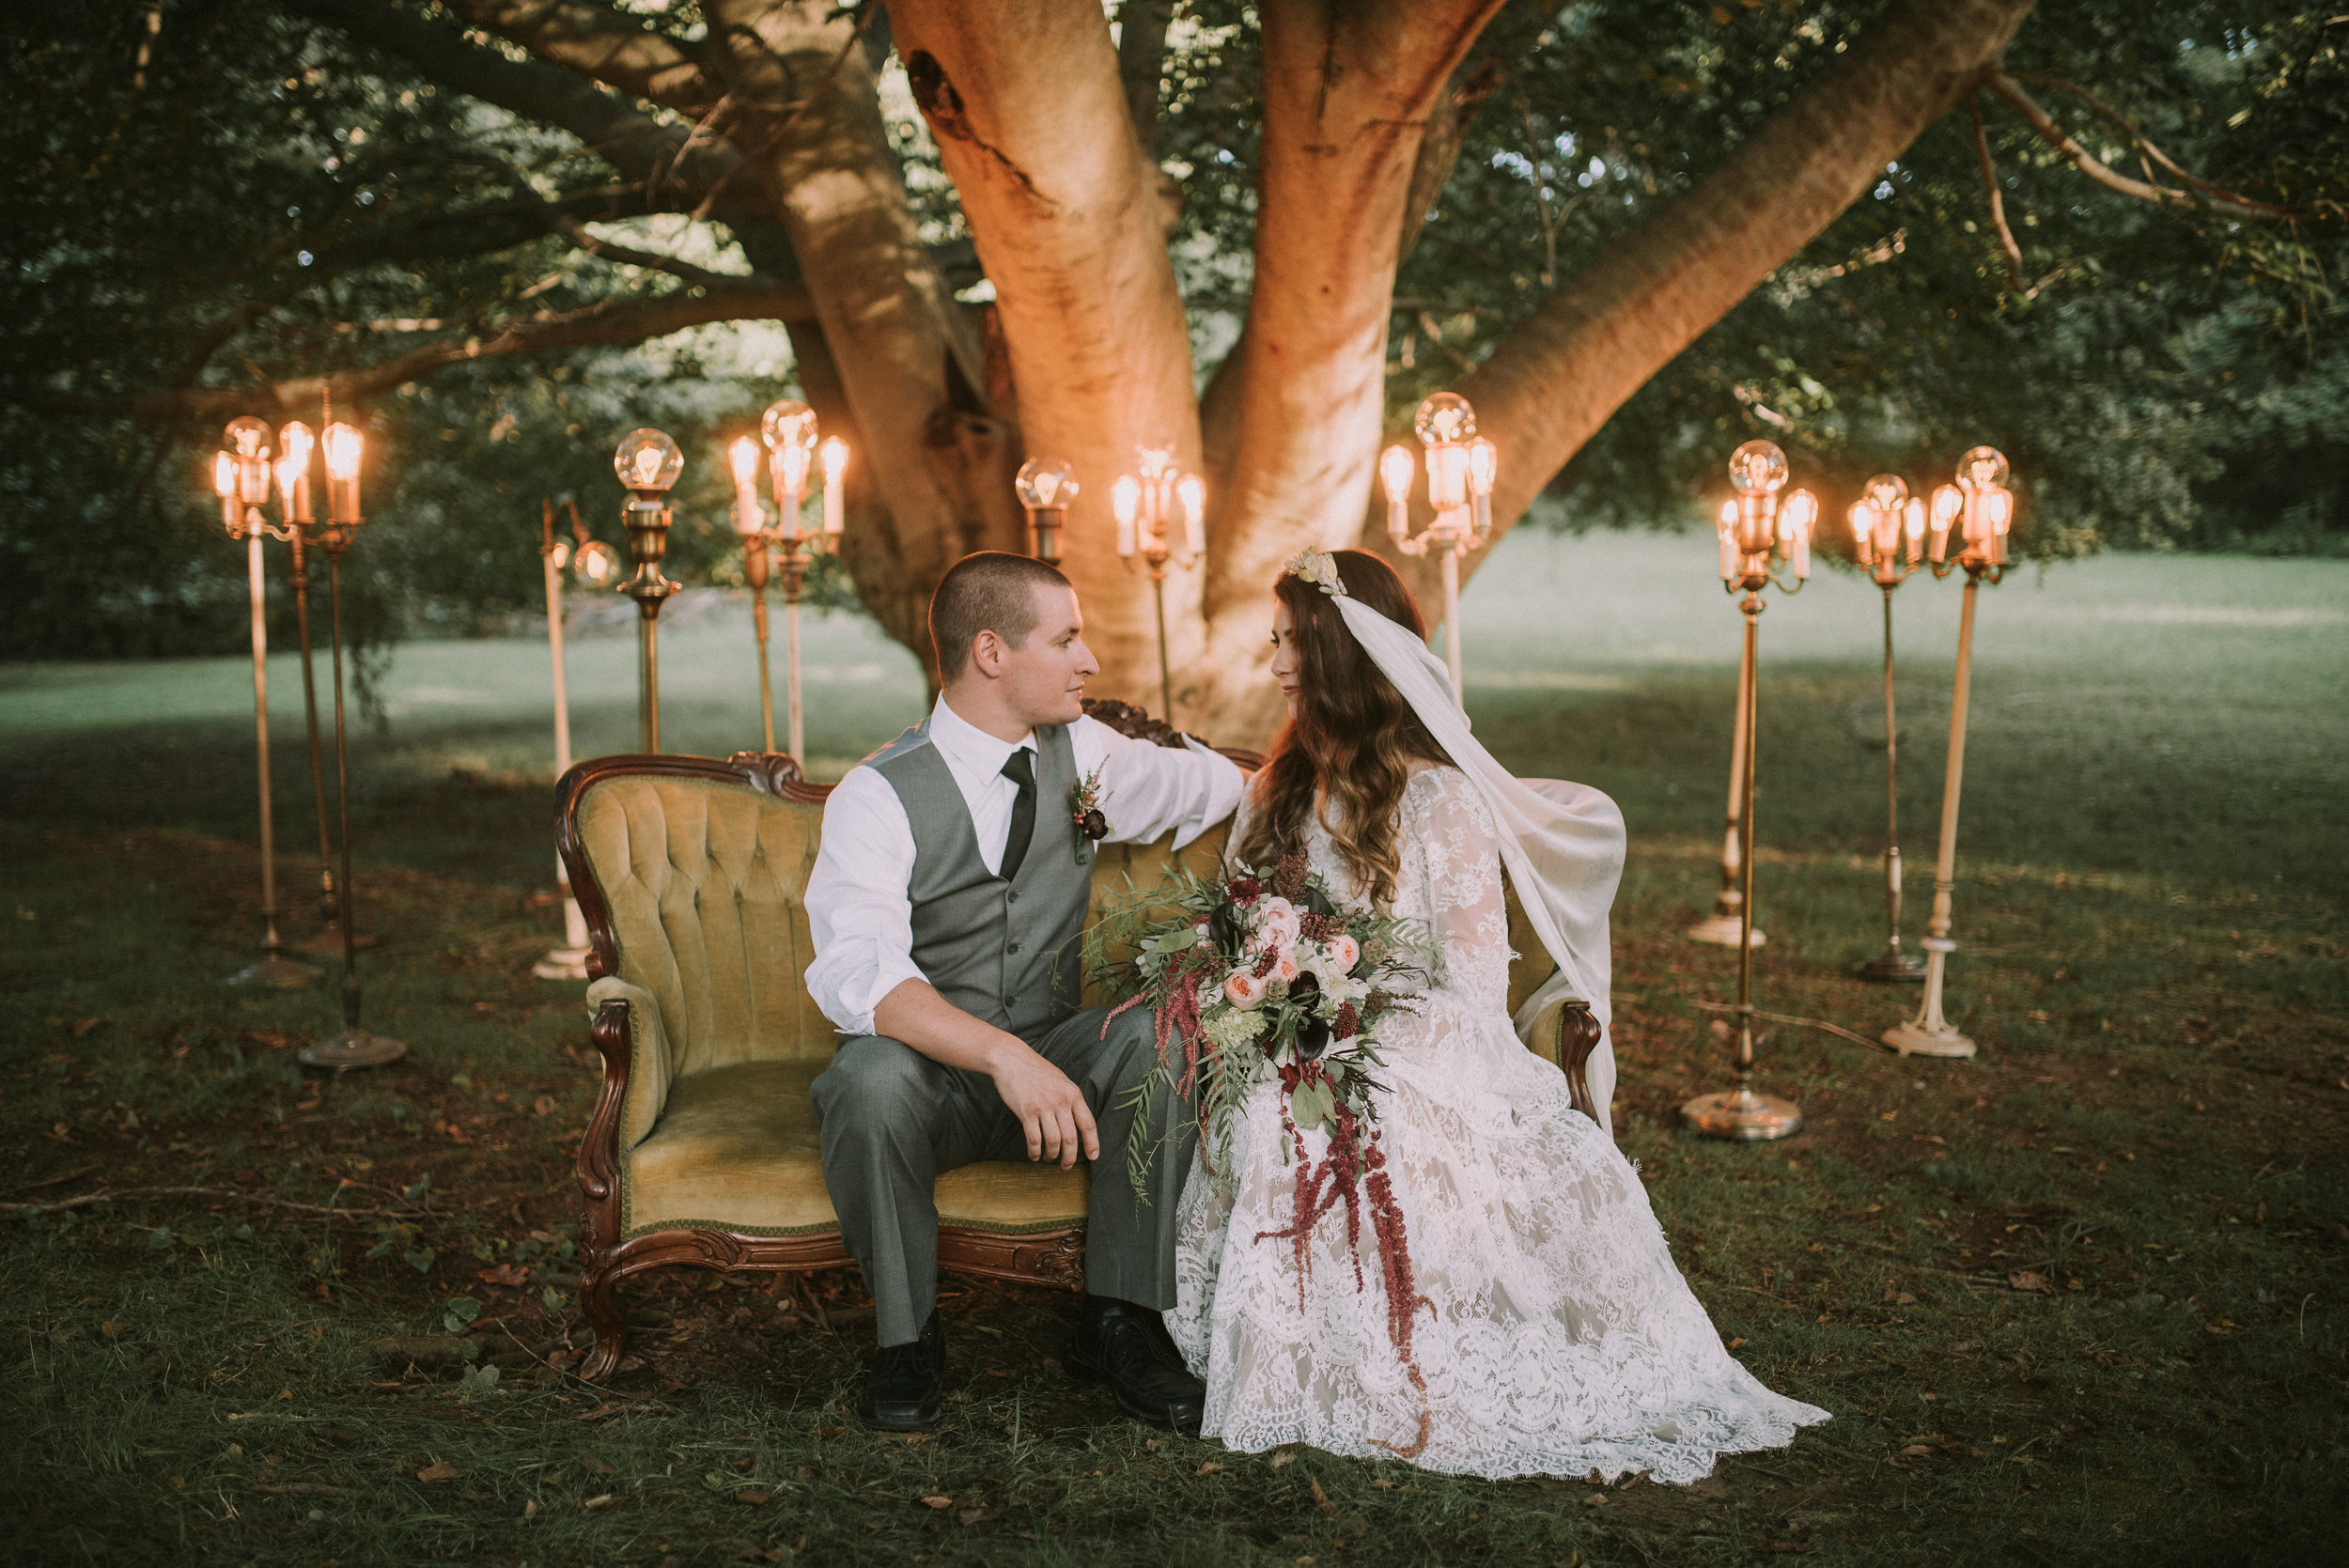 Dayton Wedding Photography | Birch House Wedding